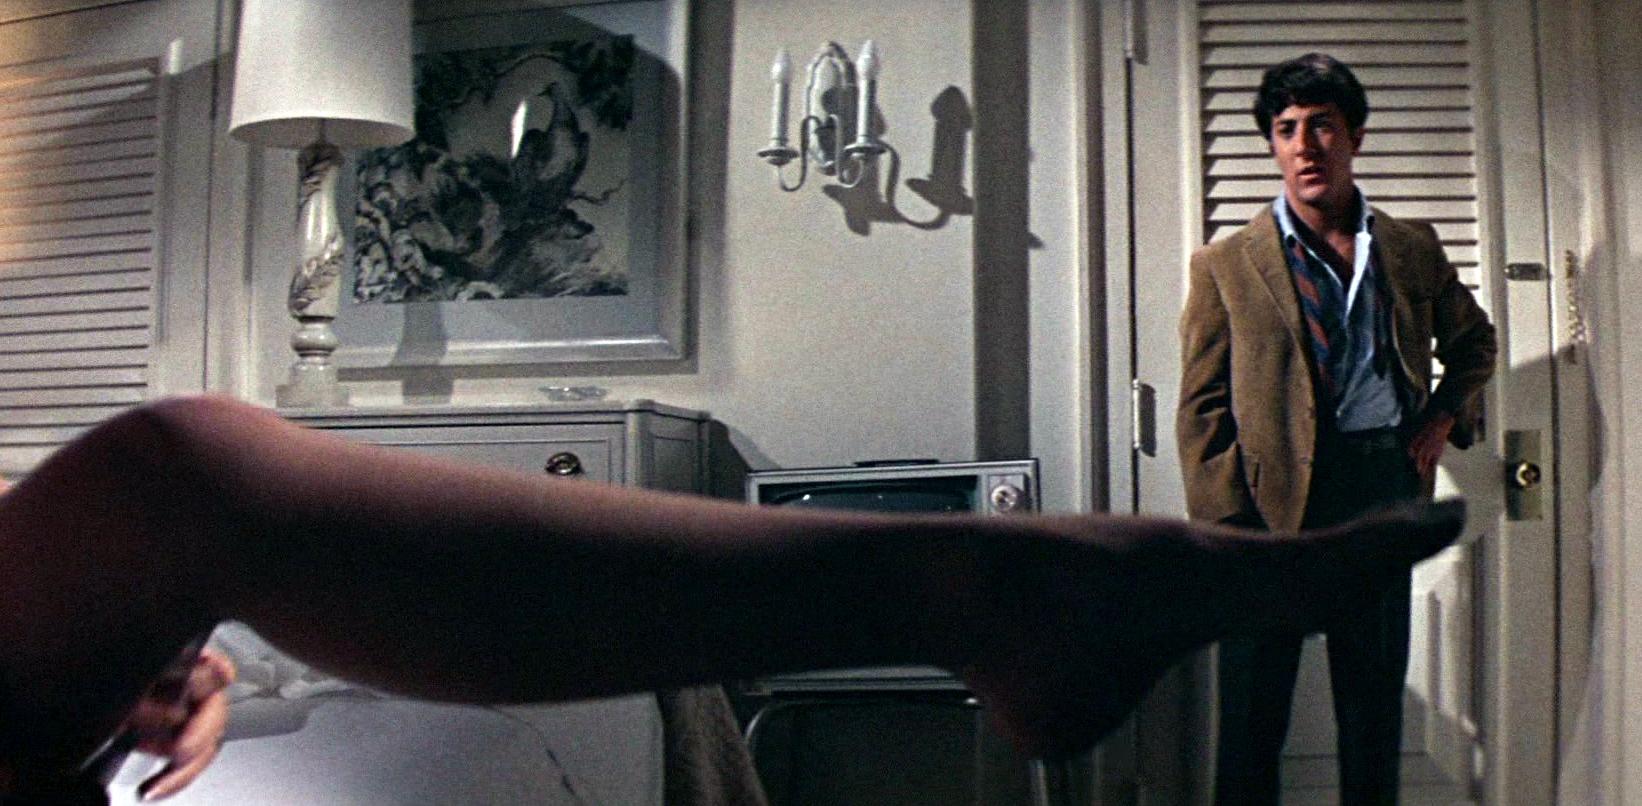 Выпускник (The Graduate) 1967